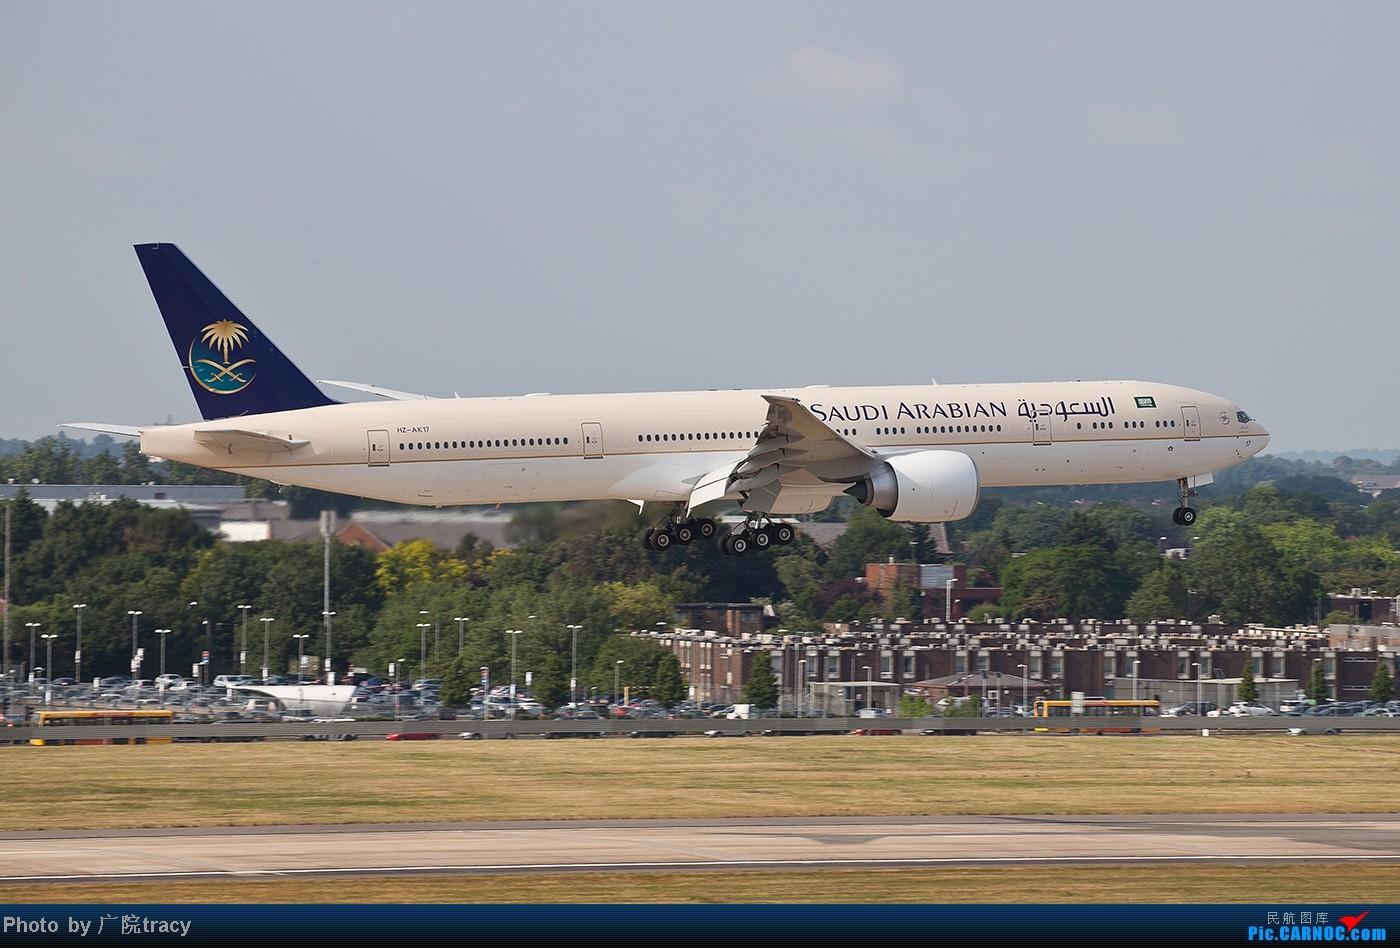 Re:[原创]★ ★ ★ ★ ★中东的航空公司在伦敦希斯罗国际机场  ★ ★ ★ ★ ★ BOEING 777-300ER HZ-AK17 英国伦敦希思罗机场